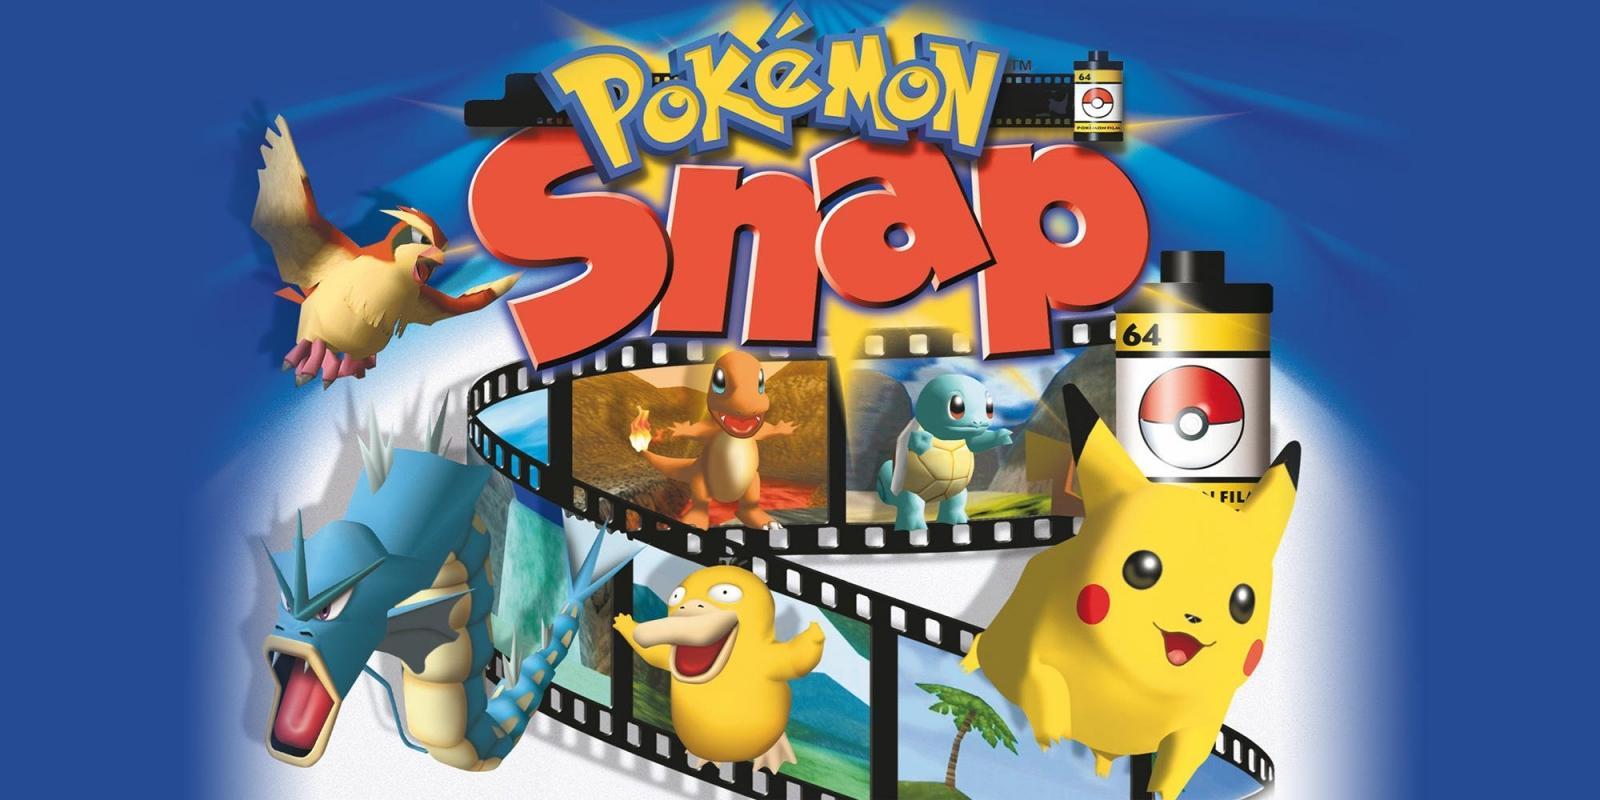 Pokemon Snap Wii U Virtual Console